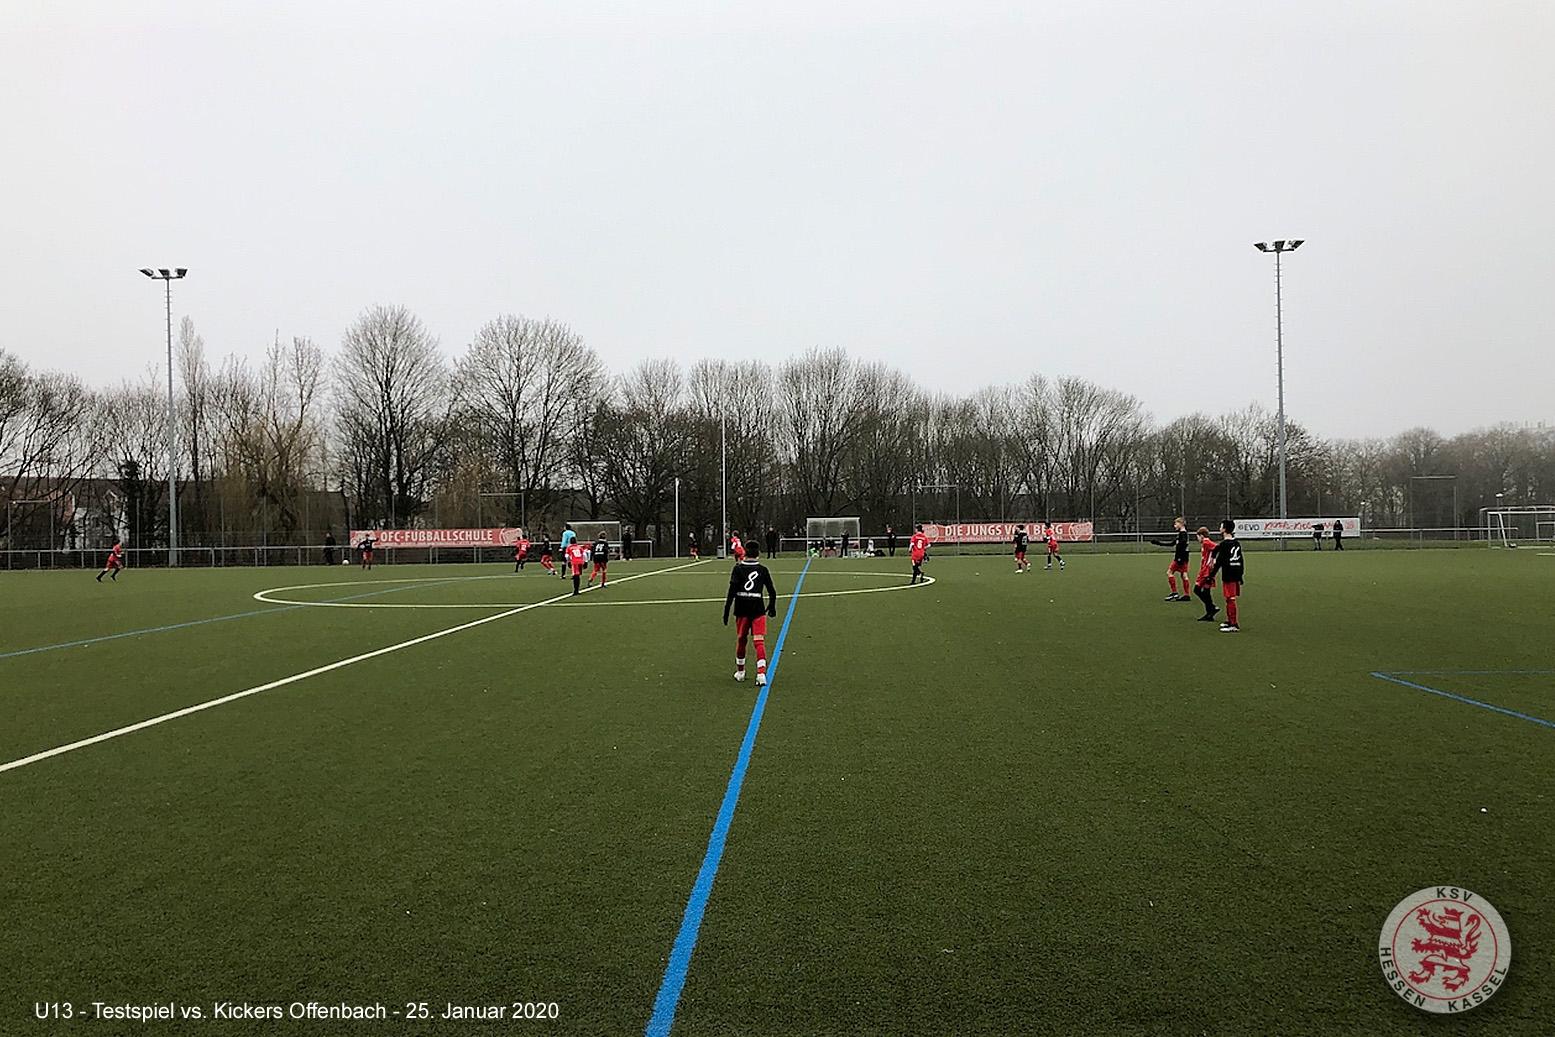 Kickers Offenbach - U13